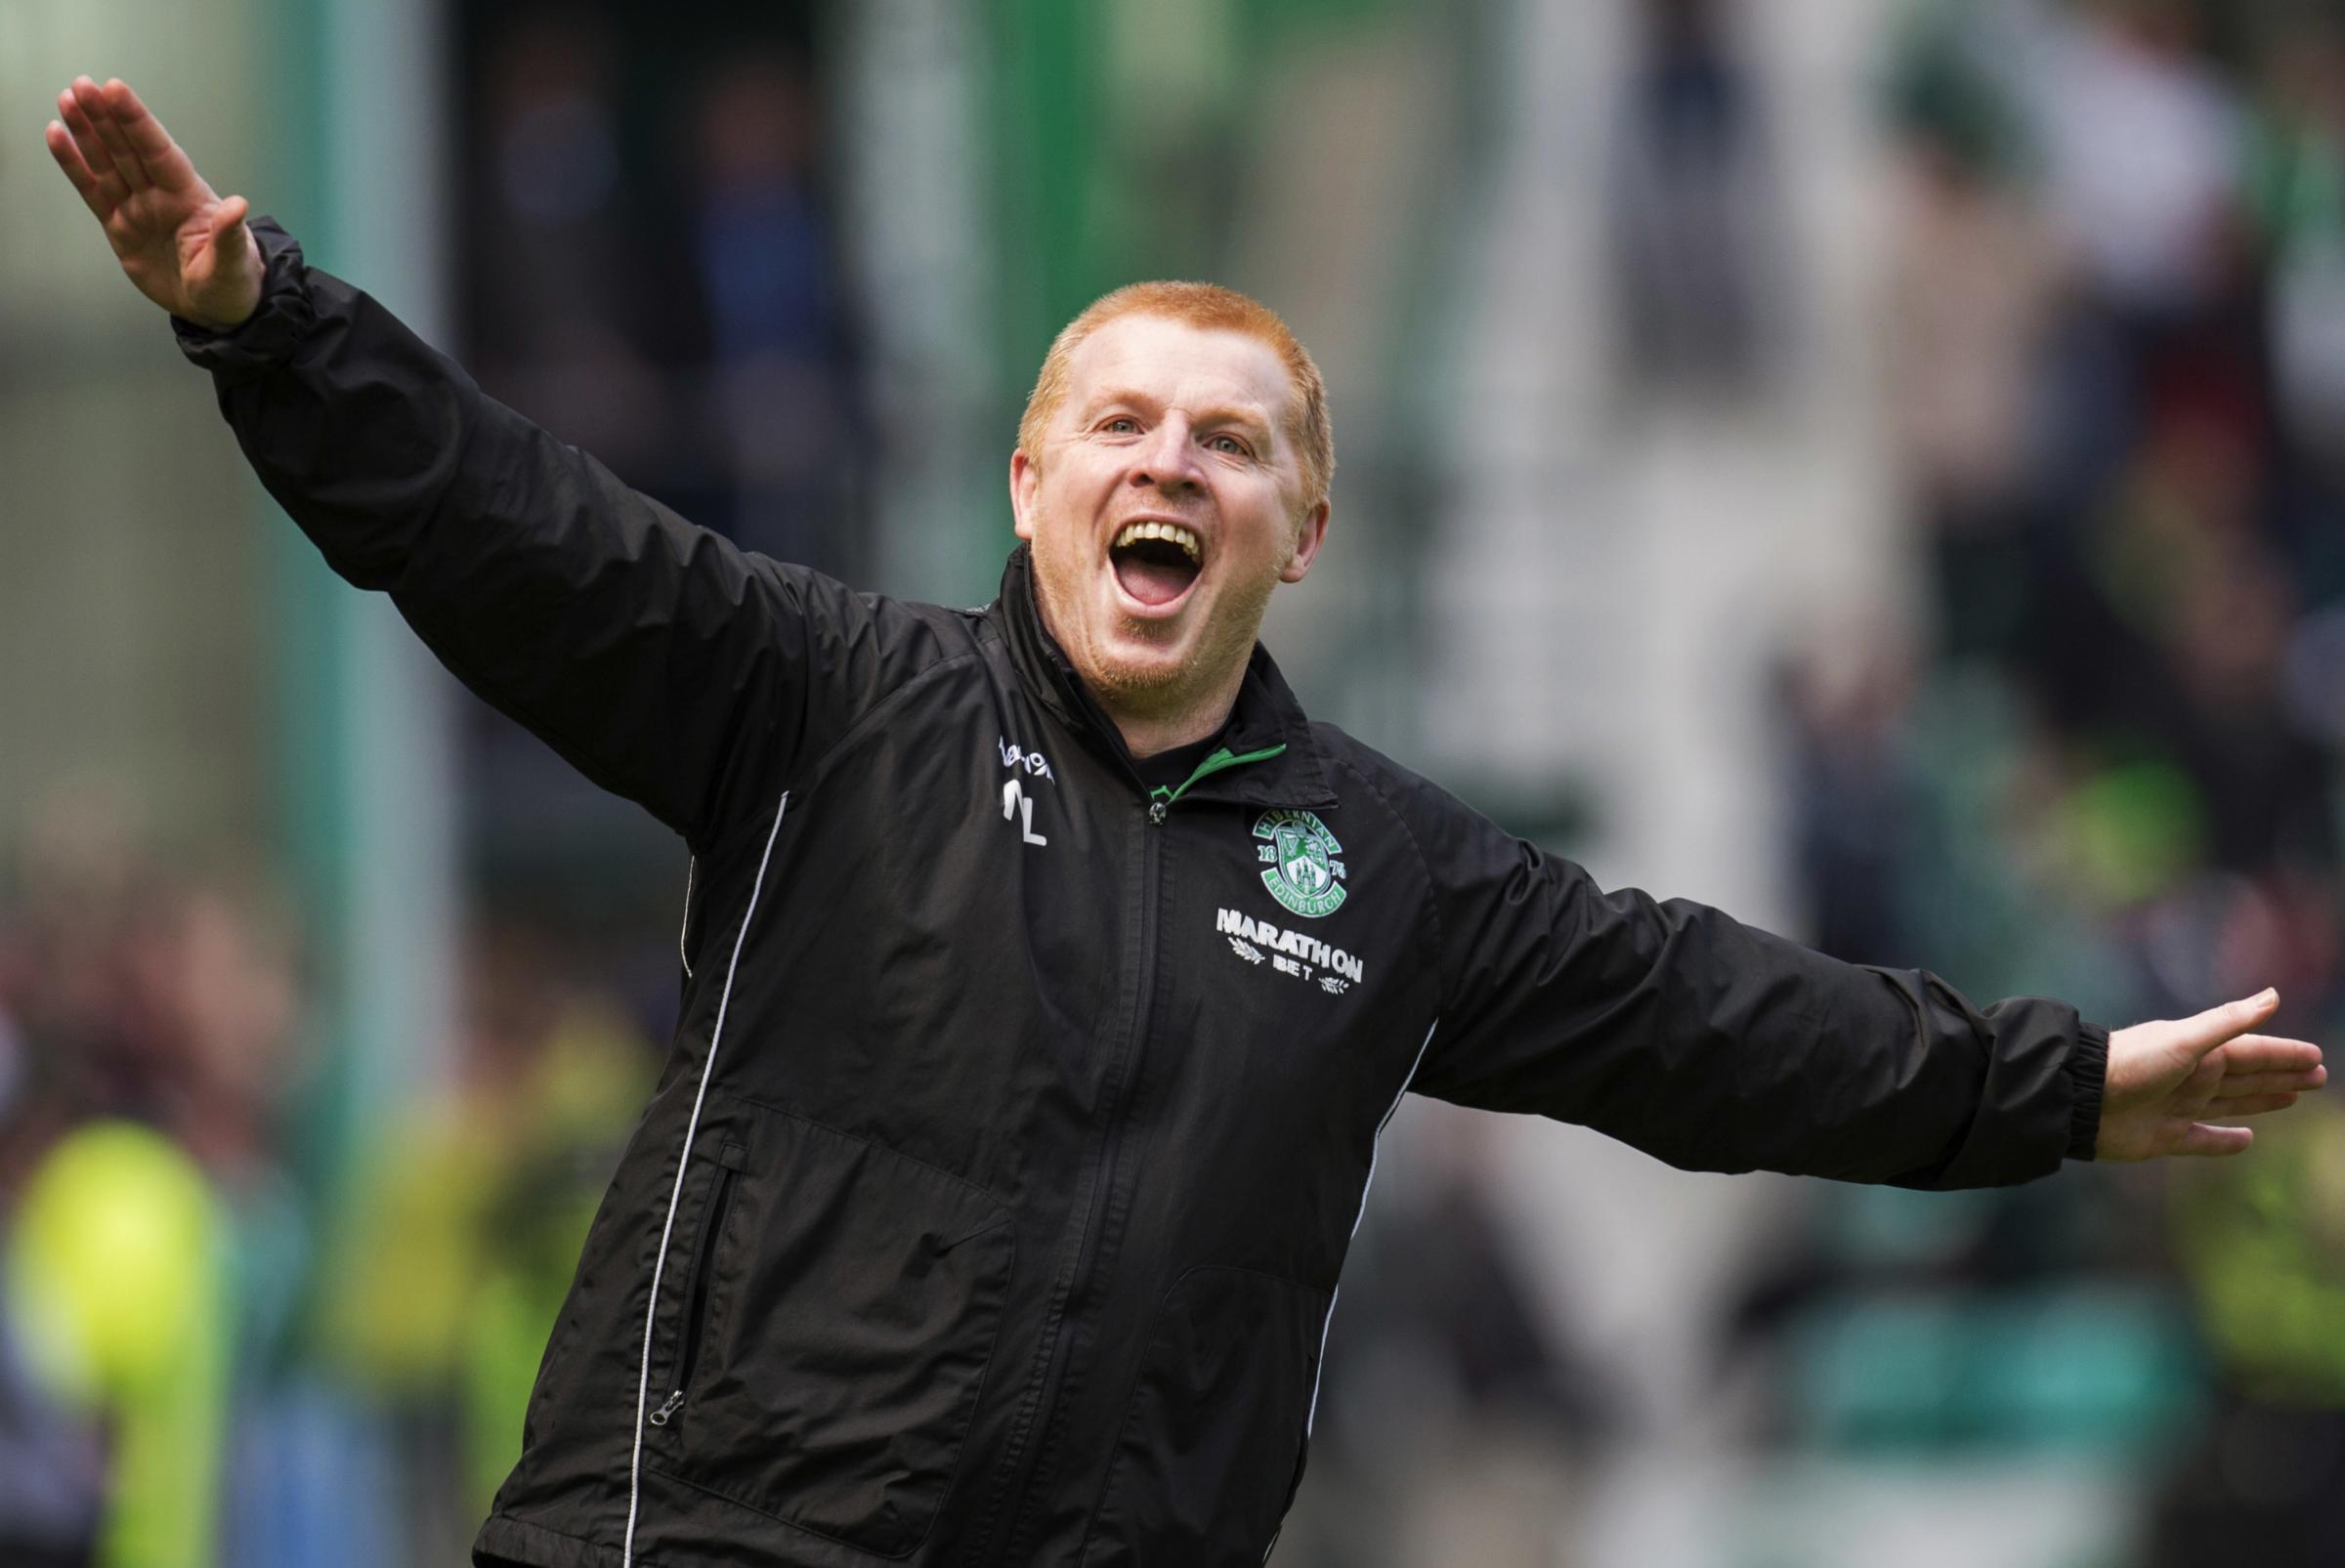 Celtic manager Neil Lennon on his debt to Hibernian after bruising Bolton spell